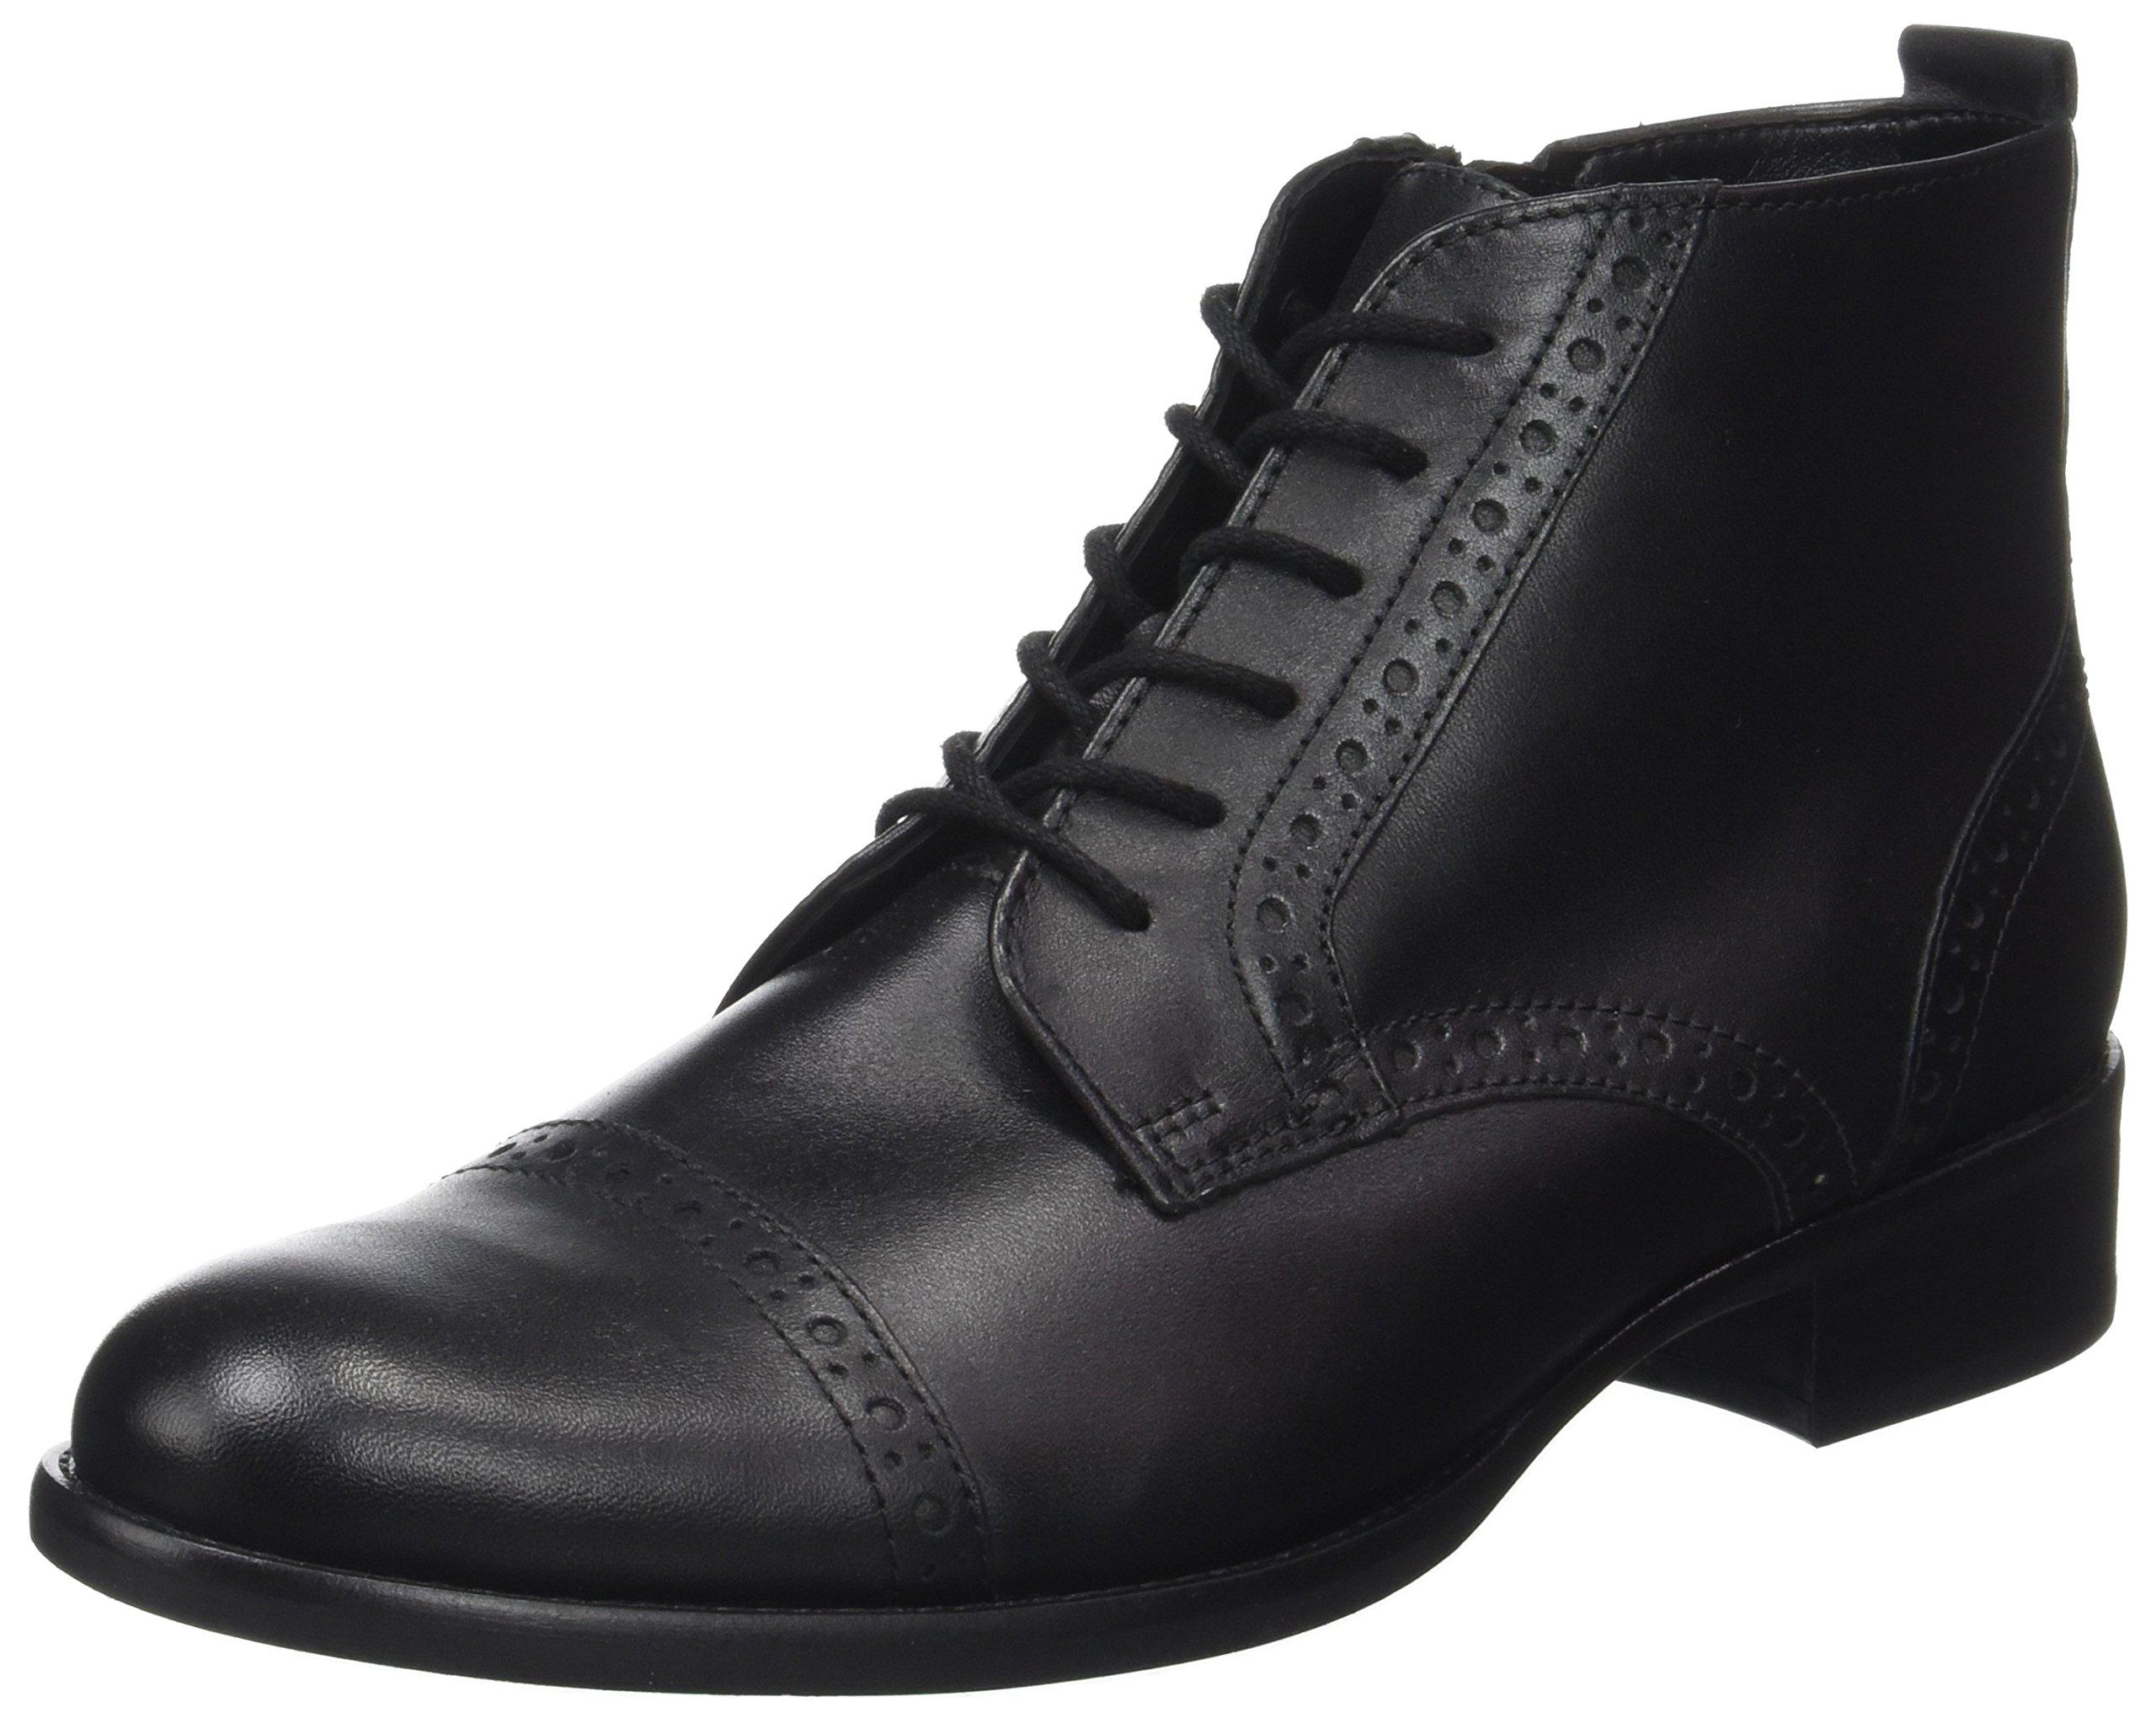 Gabor FemmeNoirschwarz41 FashionBottes Eu Shoes FashionBottes Gabor Shoes FemmeNoirschwarz41 IY7fgyb6v